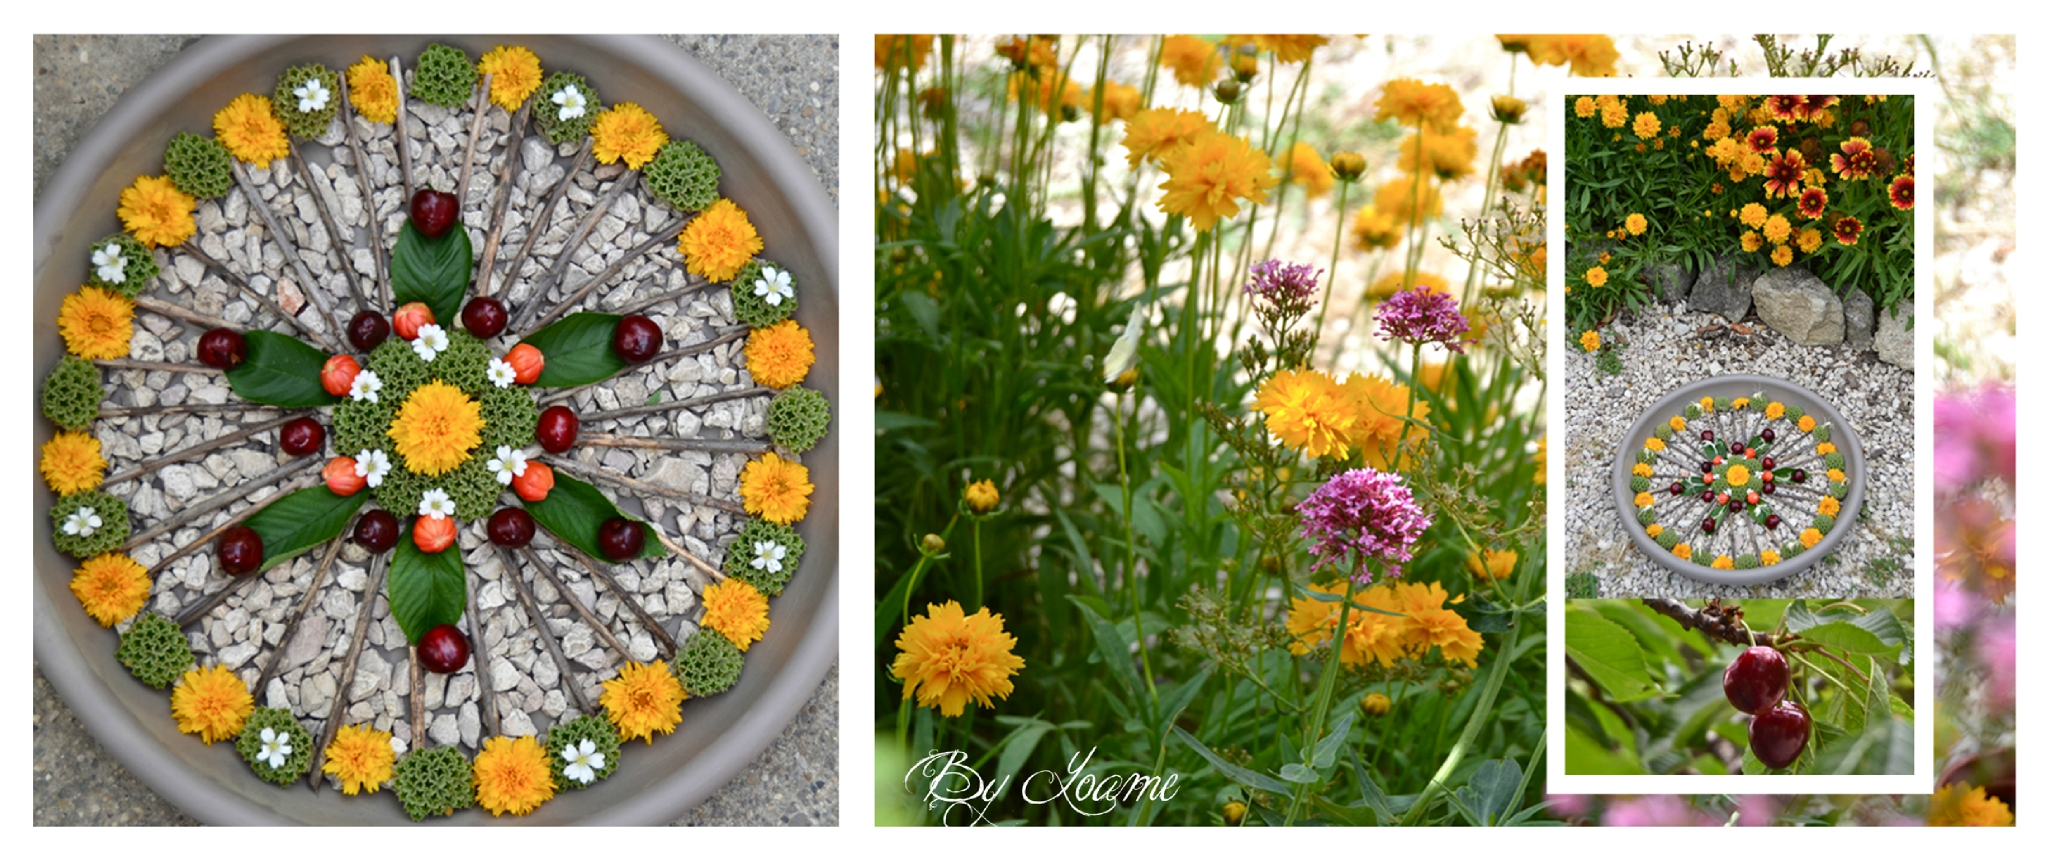 Jardin gourmand photo de mandalas des jardins au for O jardin gourmand toulouse